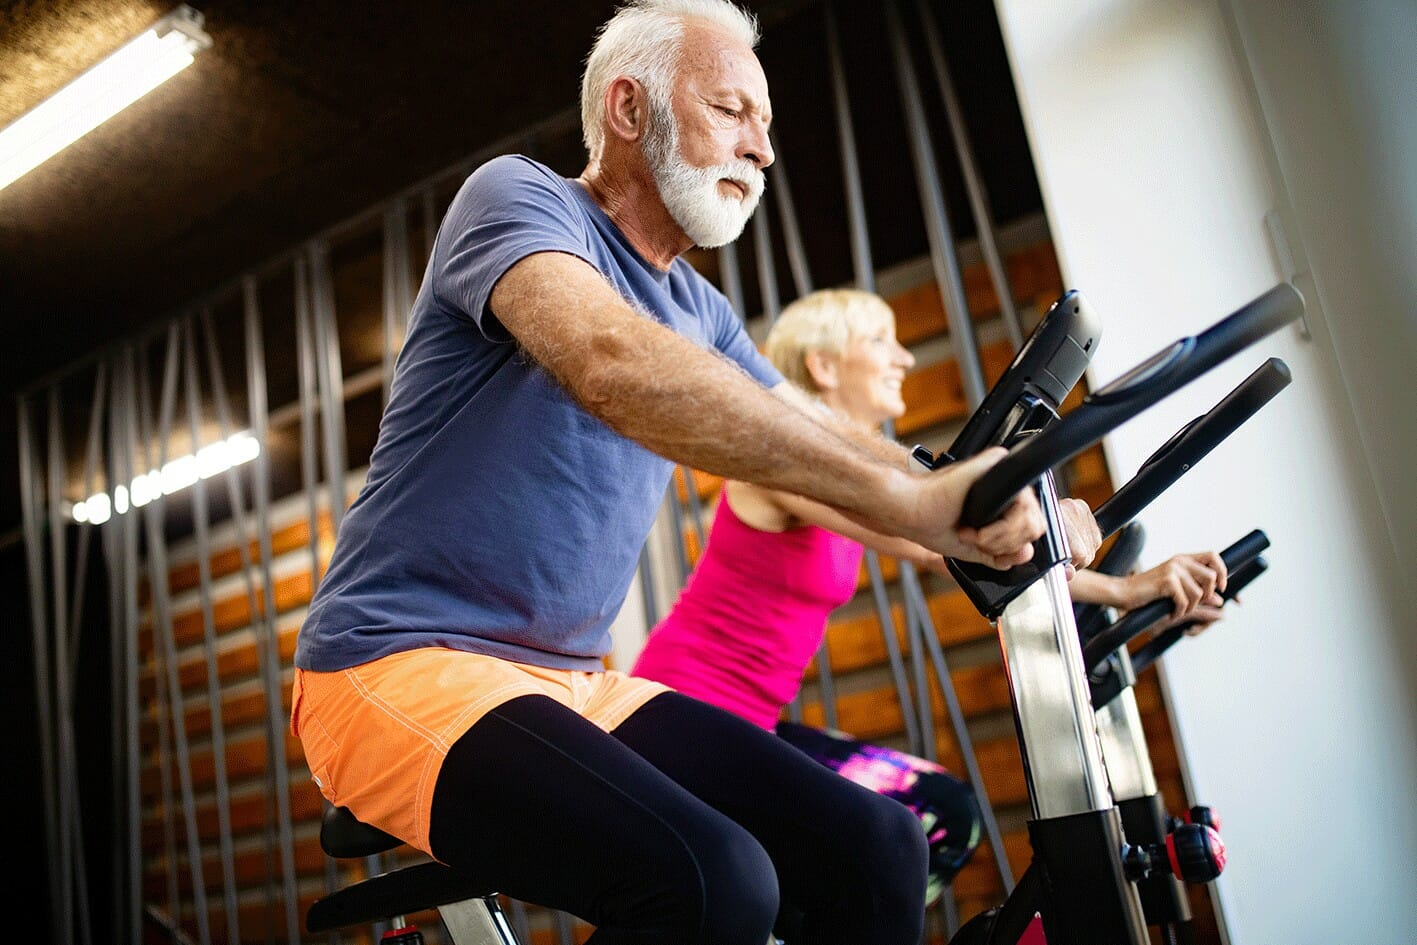 Exercice et hyperlipidémie